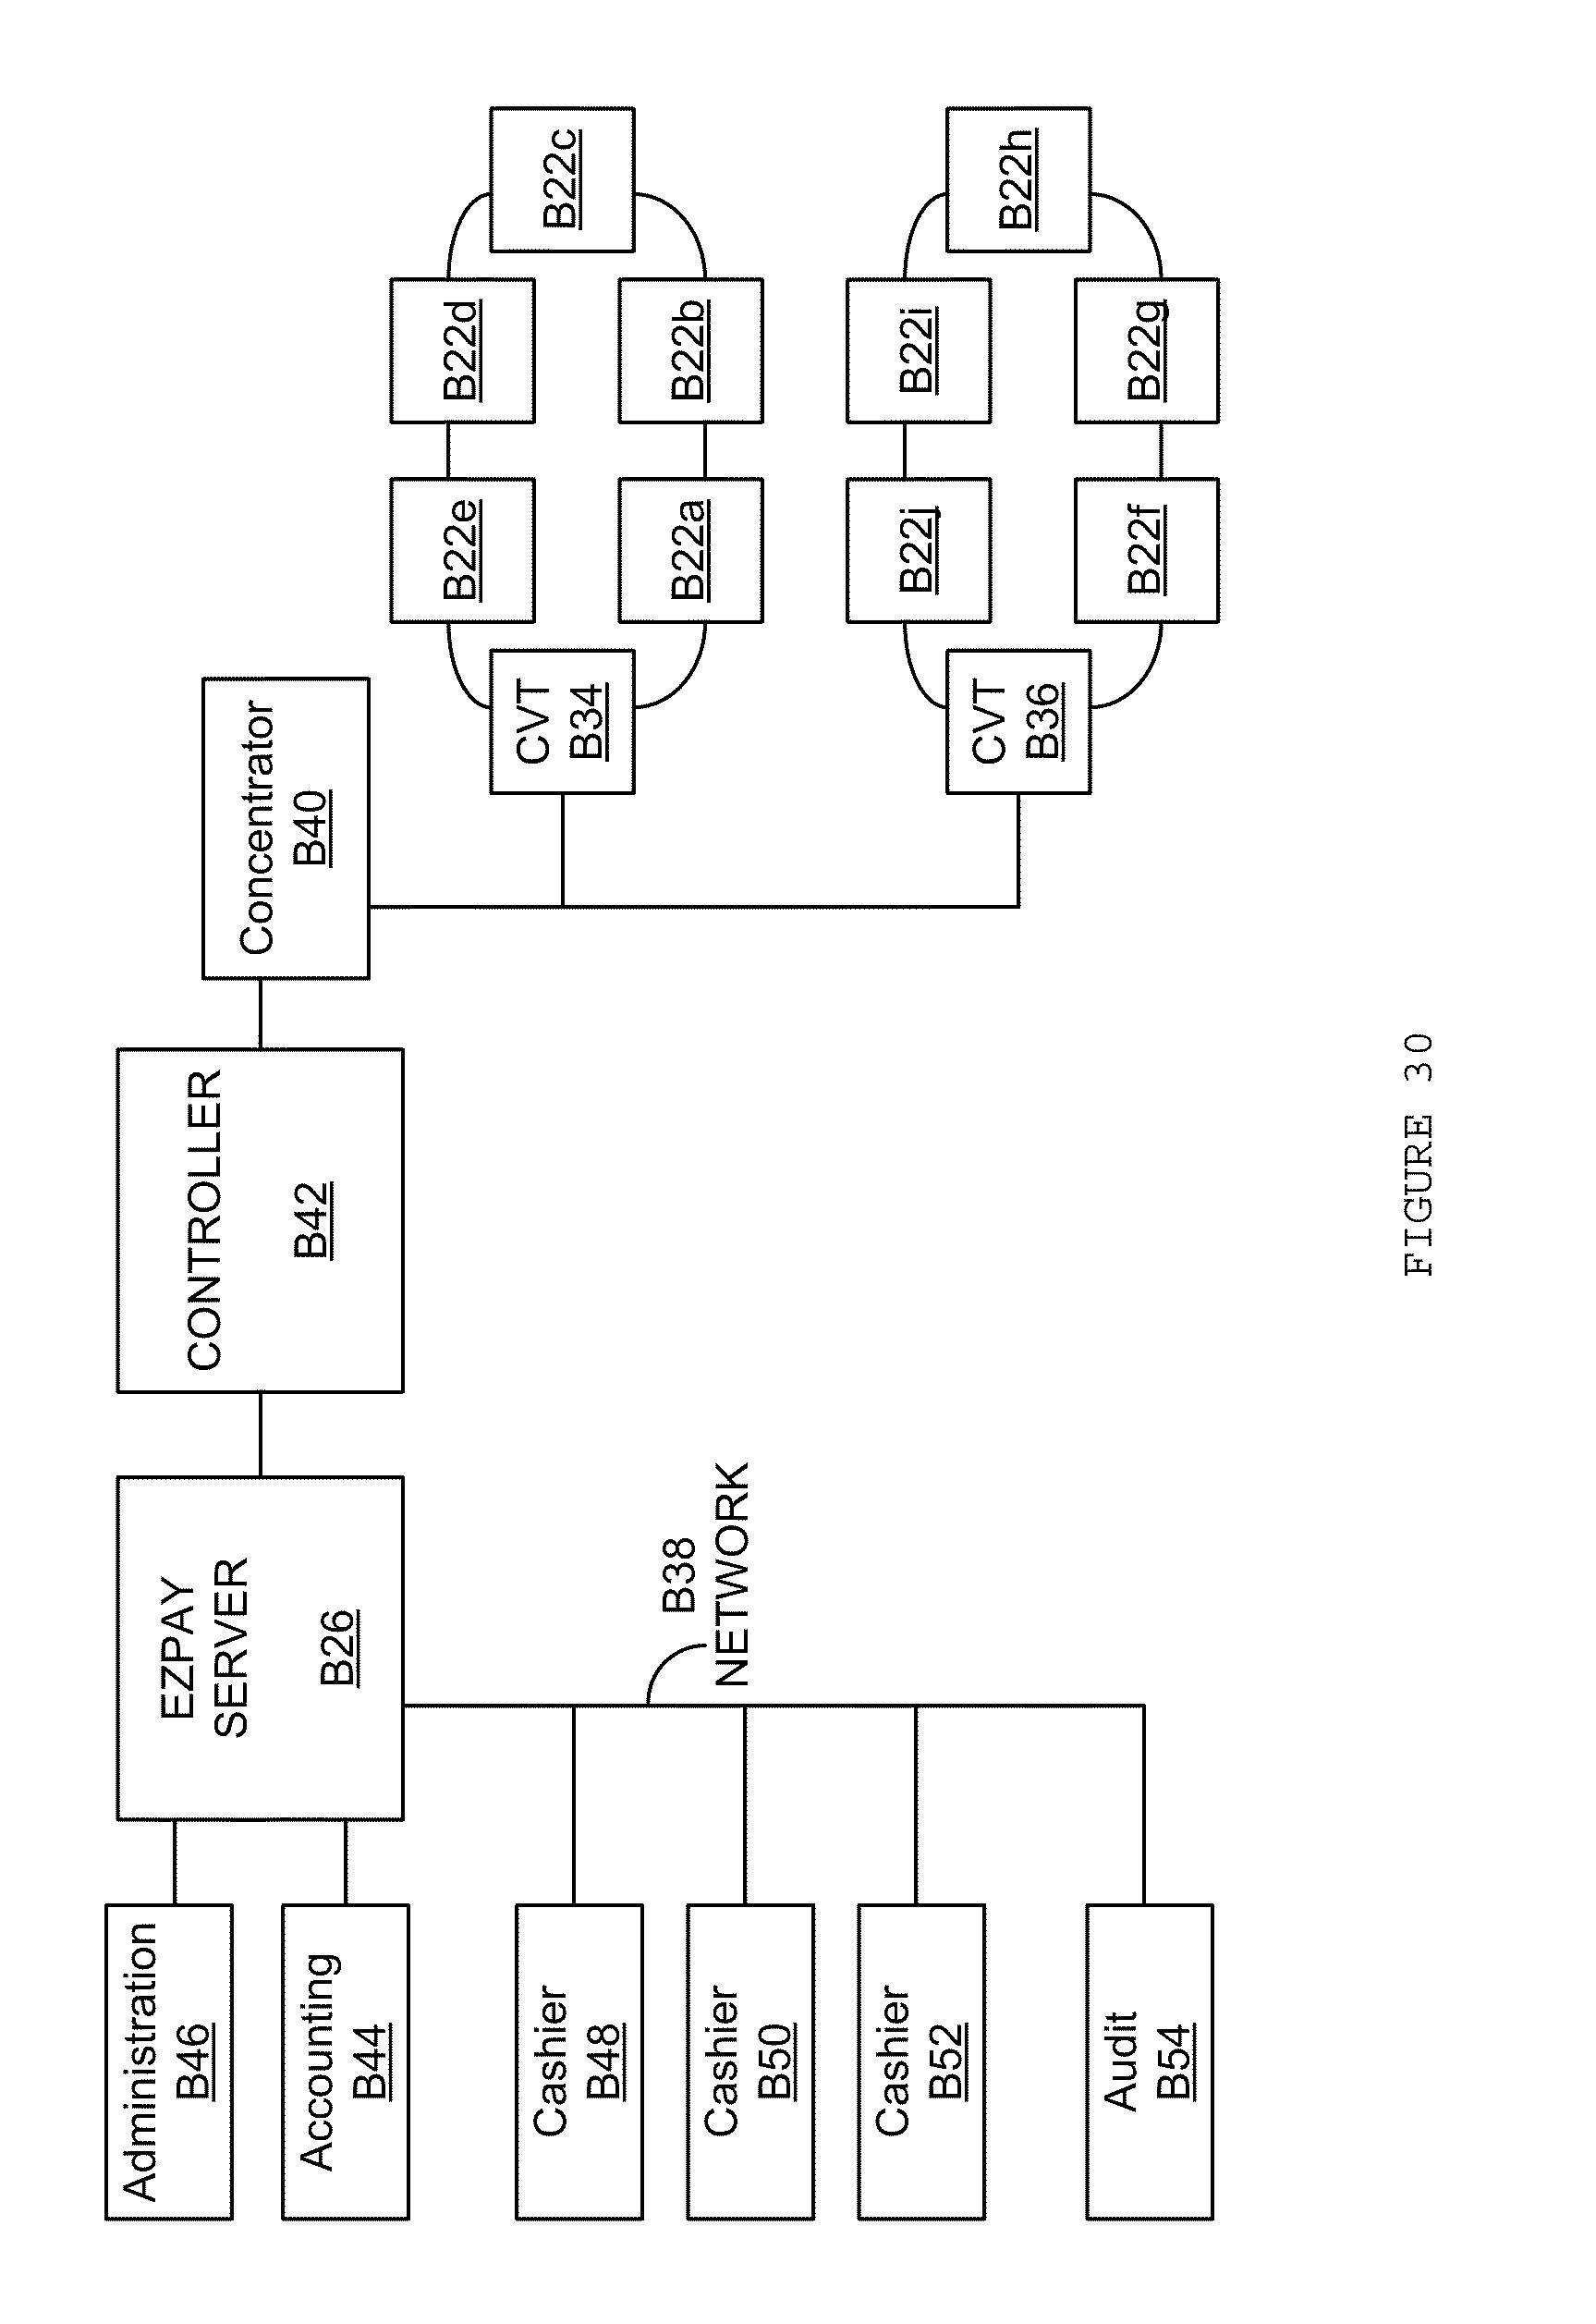 Patent US 20110275432A1